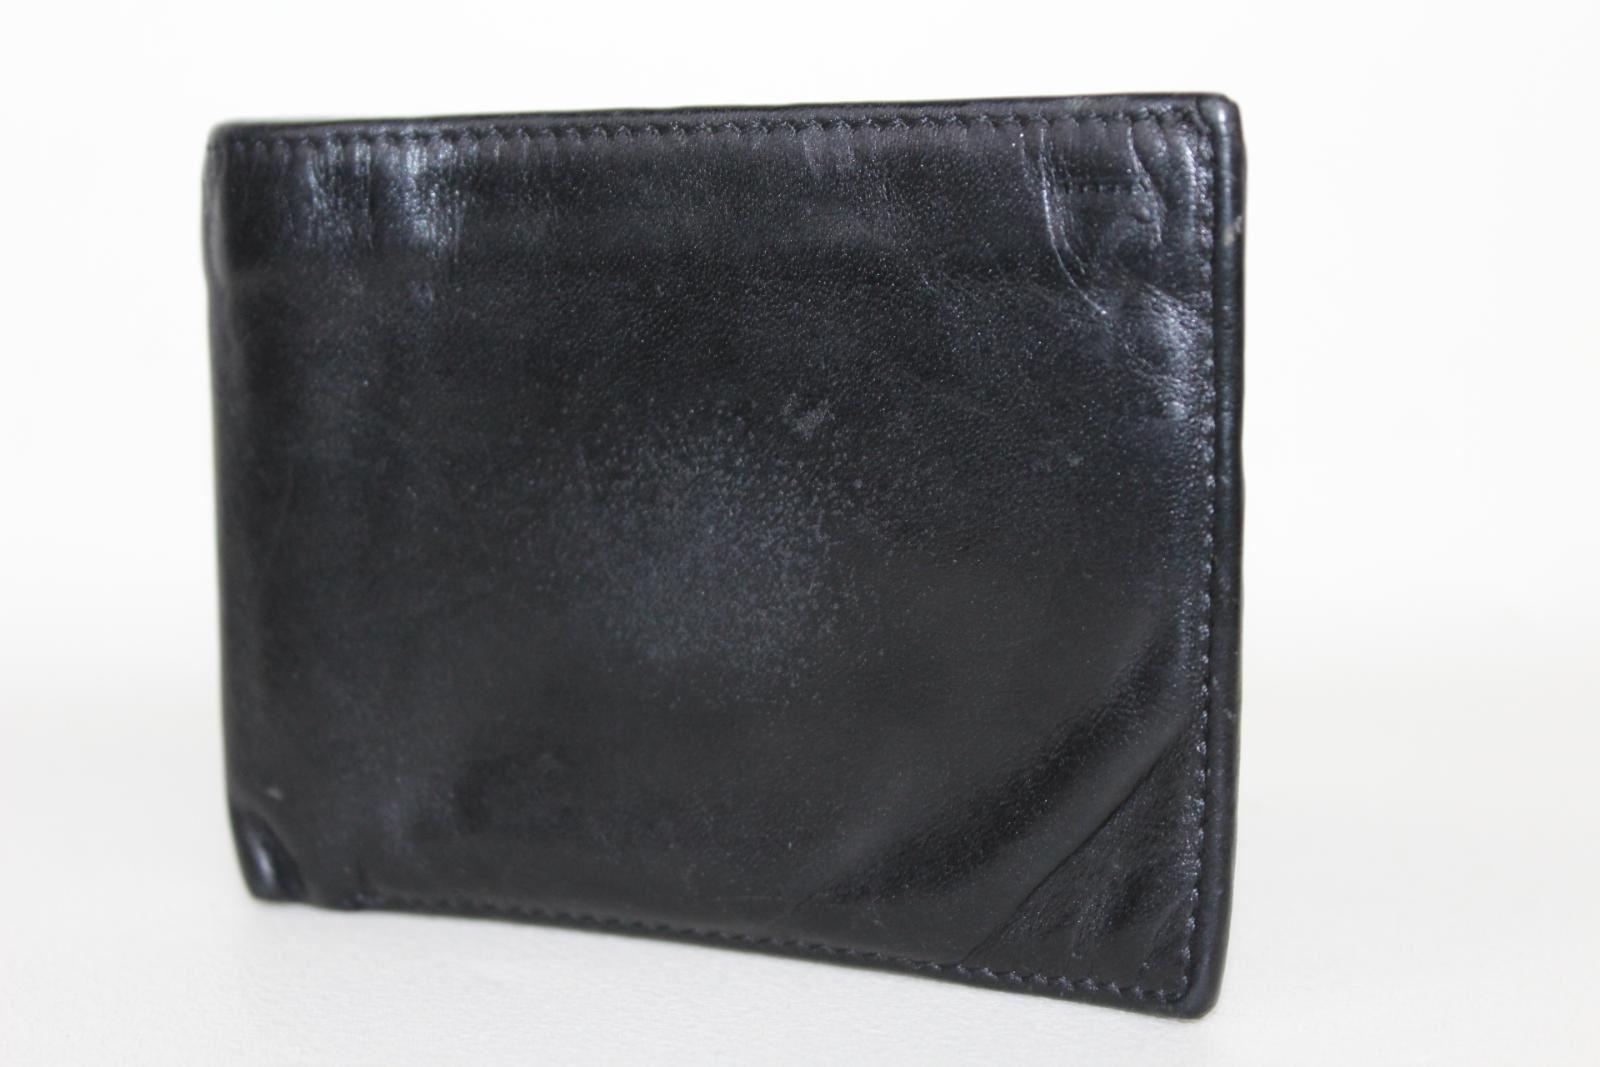 ASPINAL-OF-LONDON-Calf-Smooth-Black-amp-Red-Interior-8-Card-Billfold-Wallet